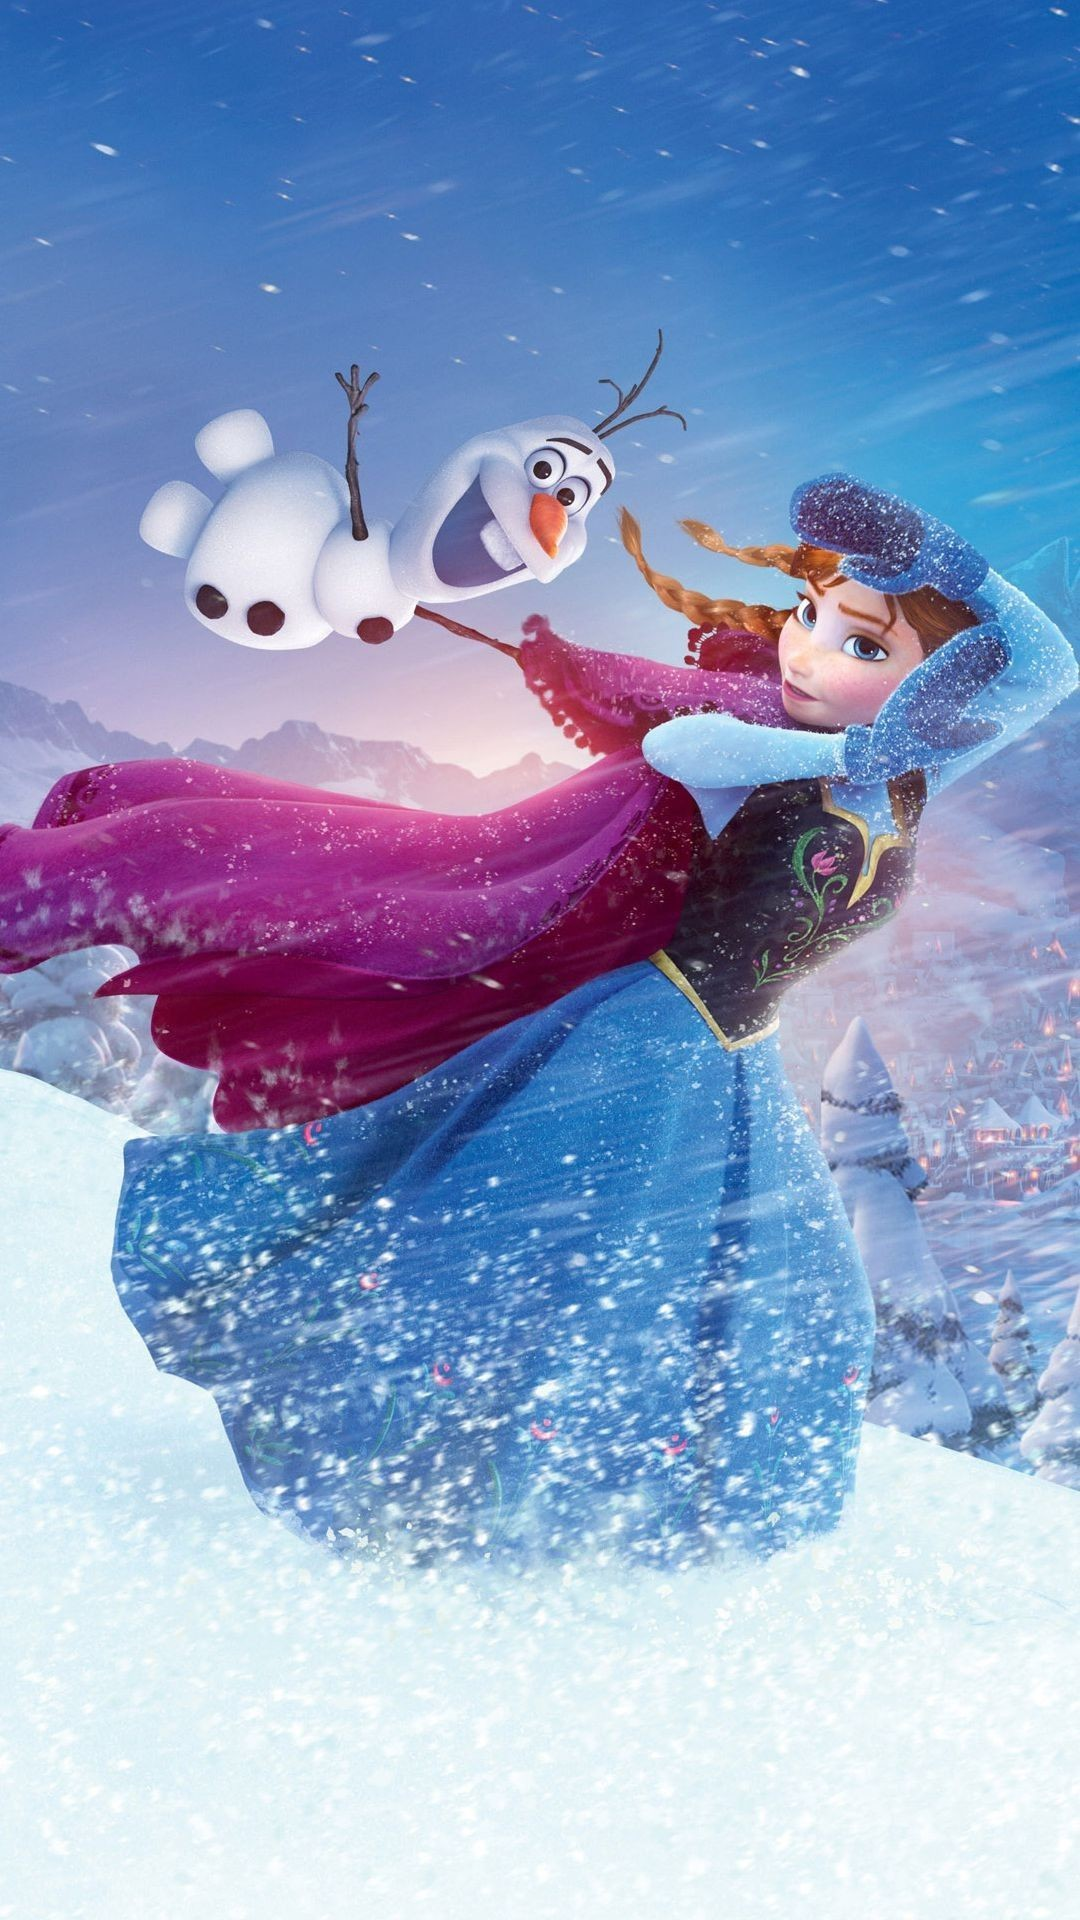 62 Olaf Christmas Wallpapers on WallpaperPlay